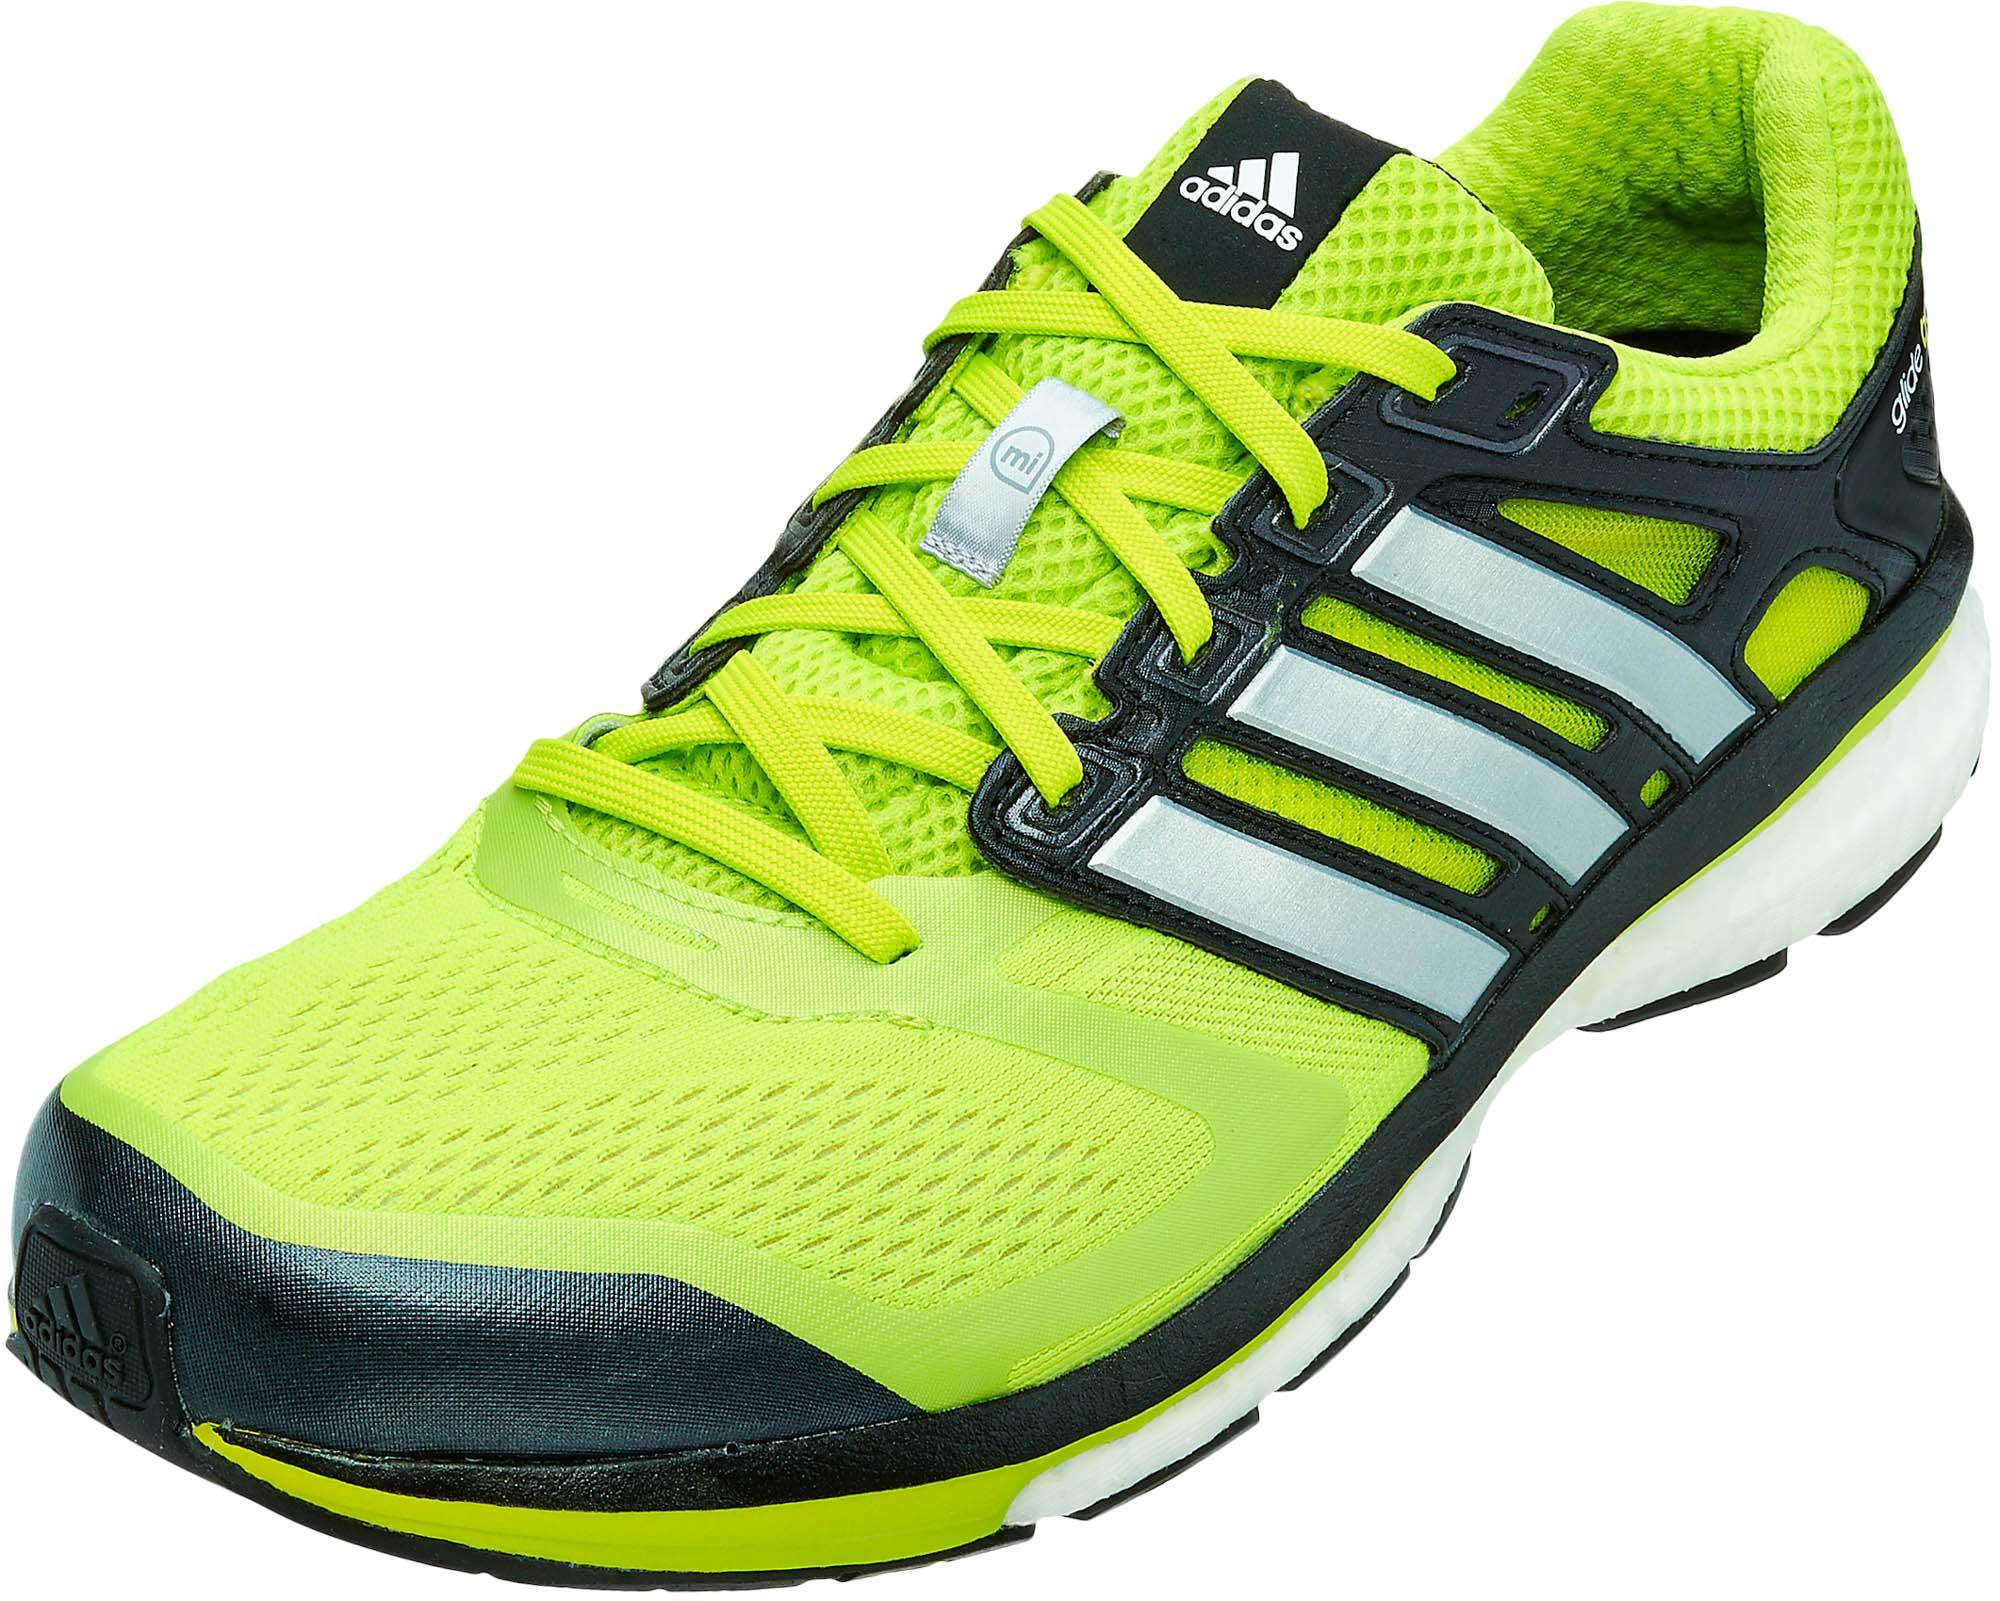 Adidas Supernova Boost Boost zapatos zapatillas verde